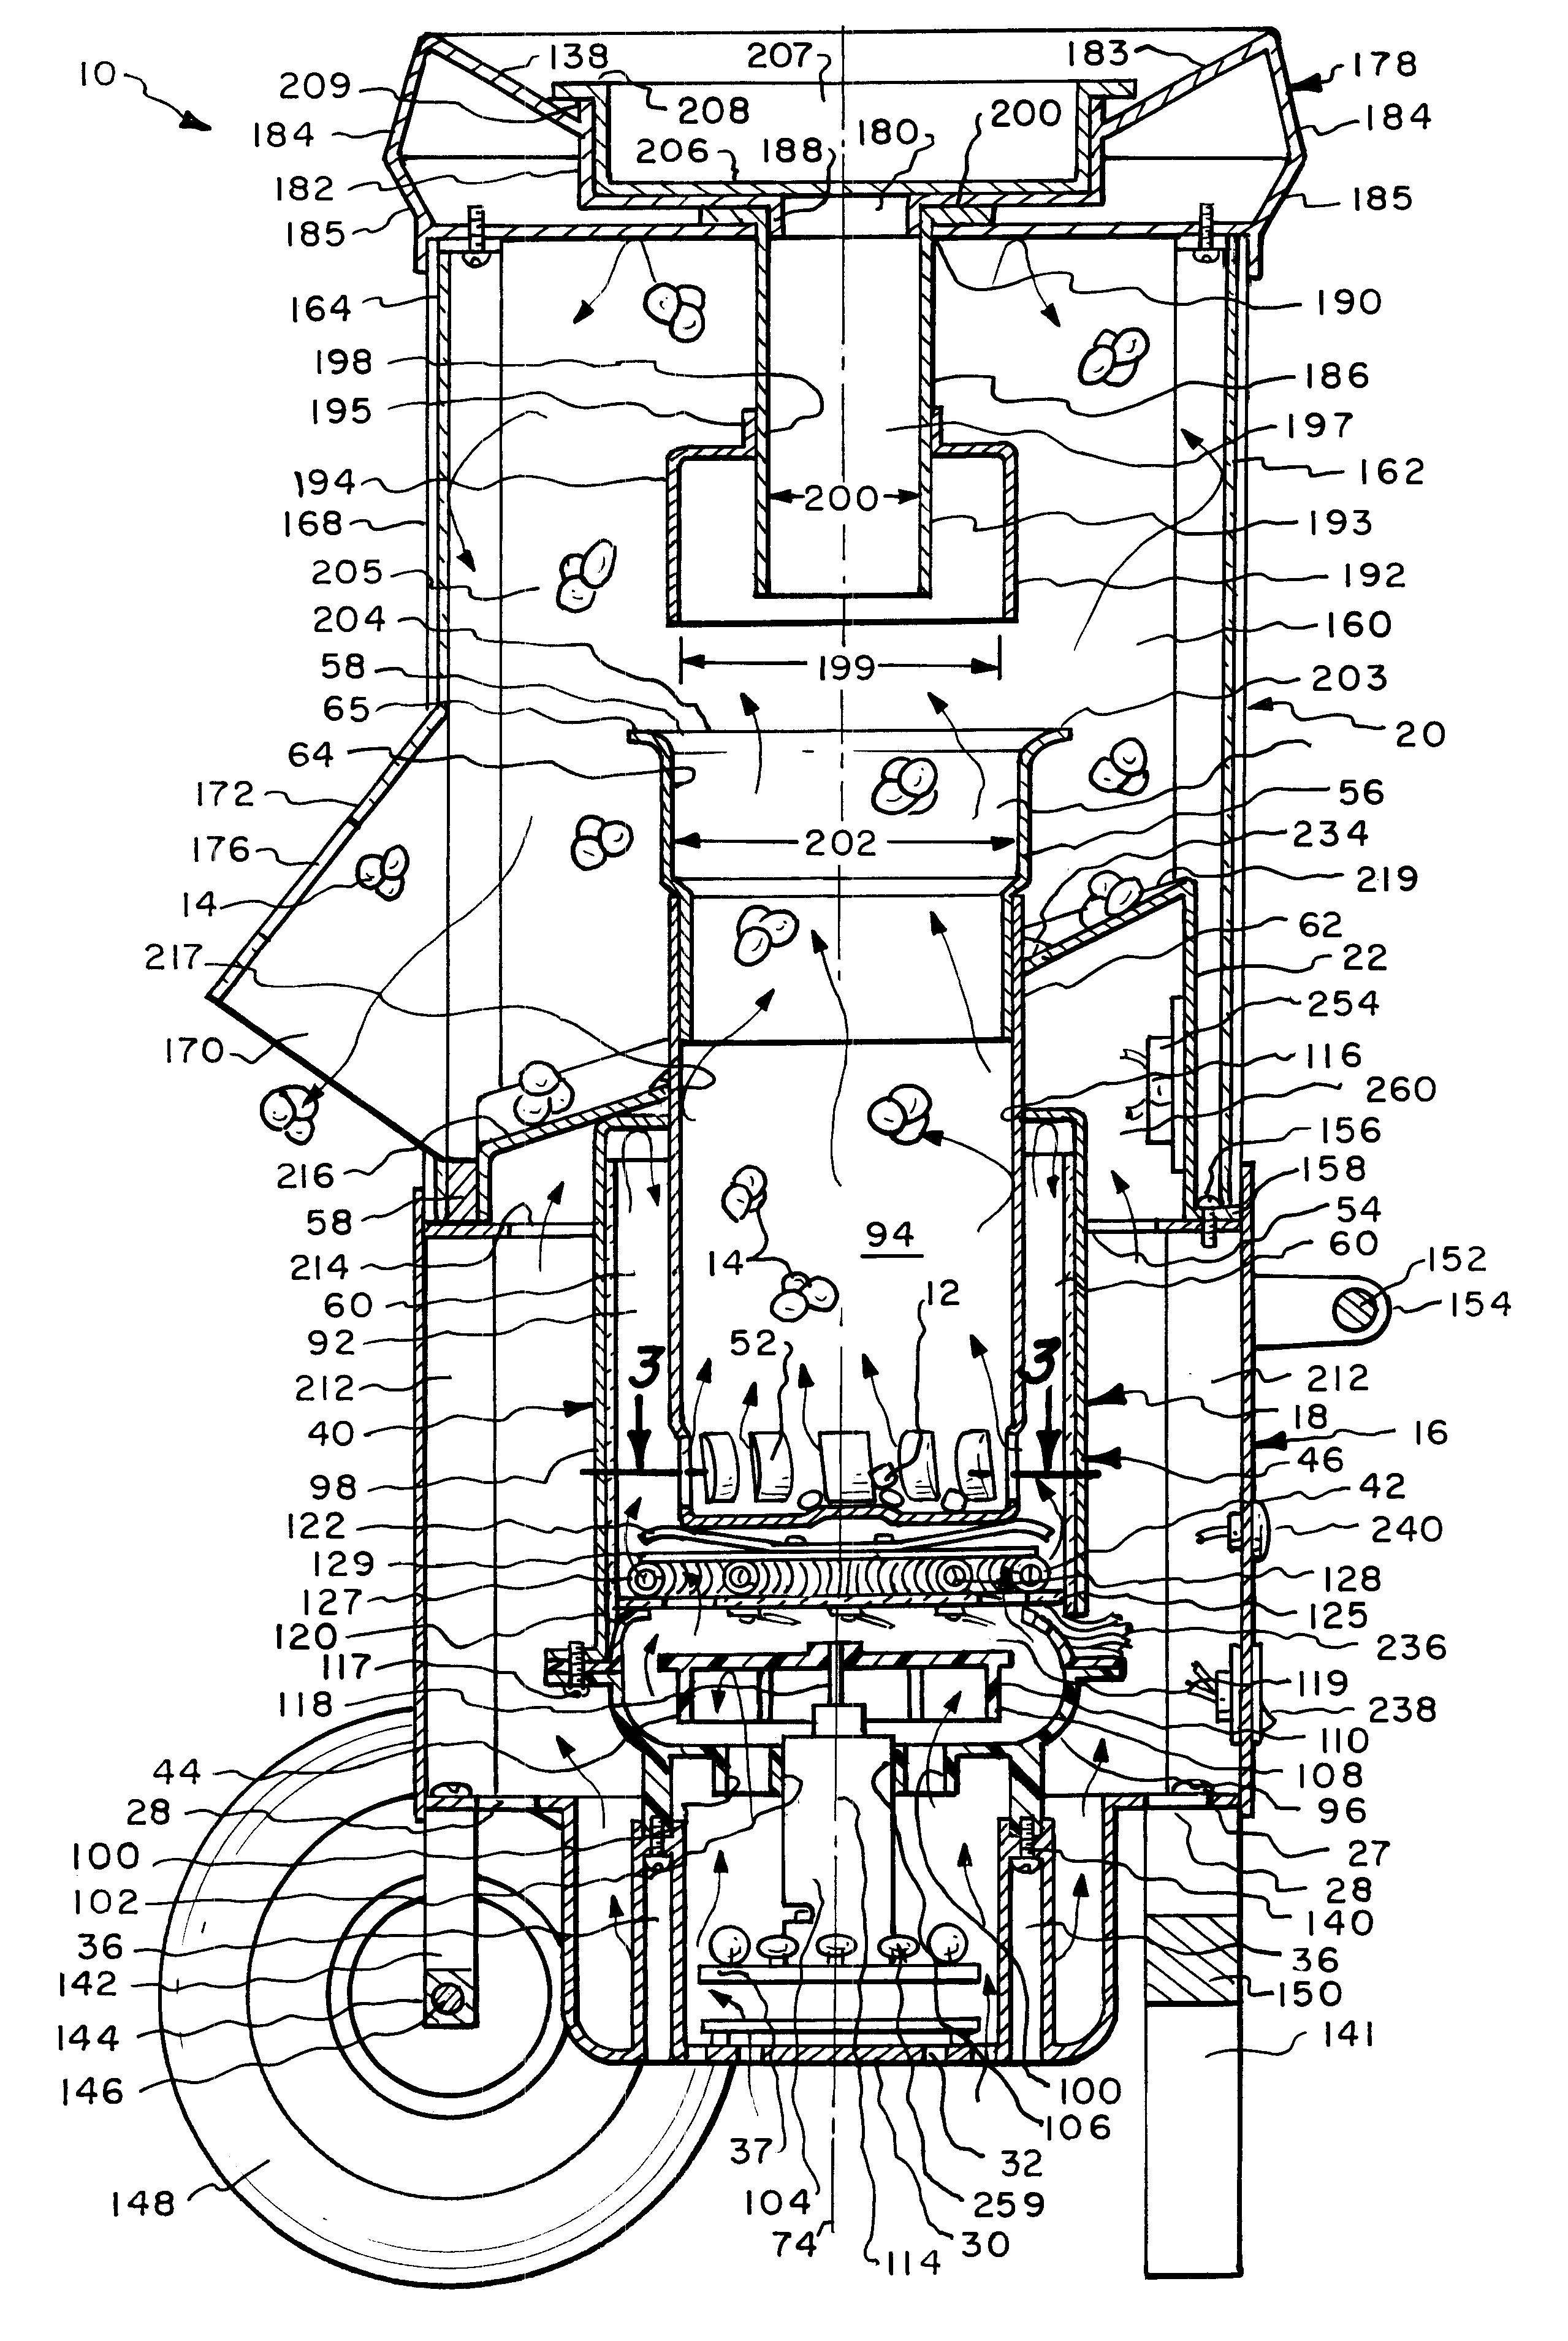 Gold Medal Popcorn Machine Wiring Diagram : 41 Wiring